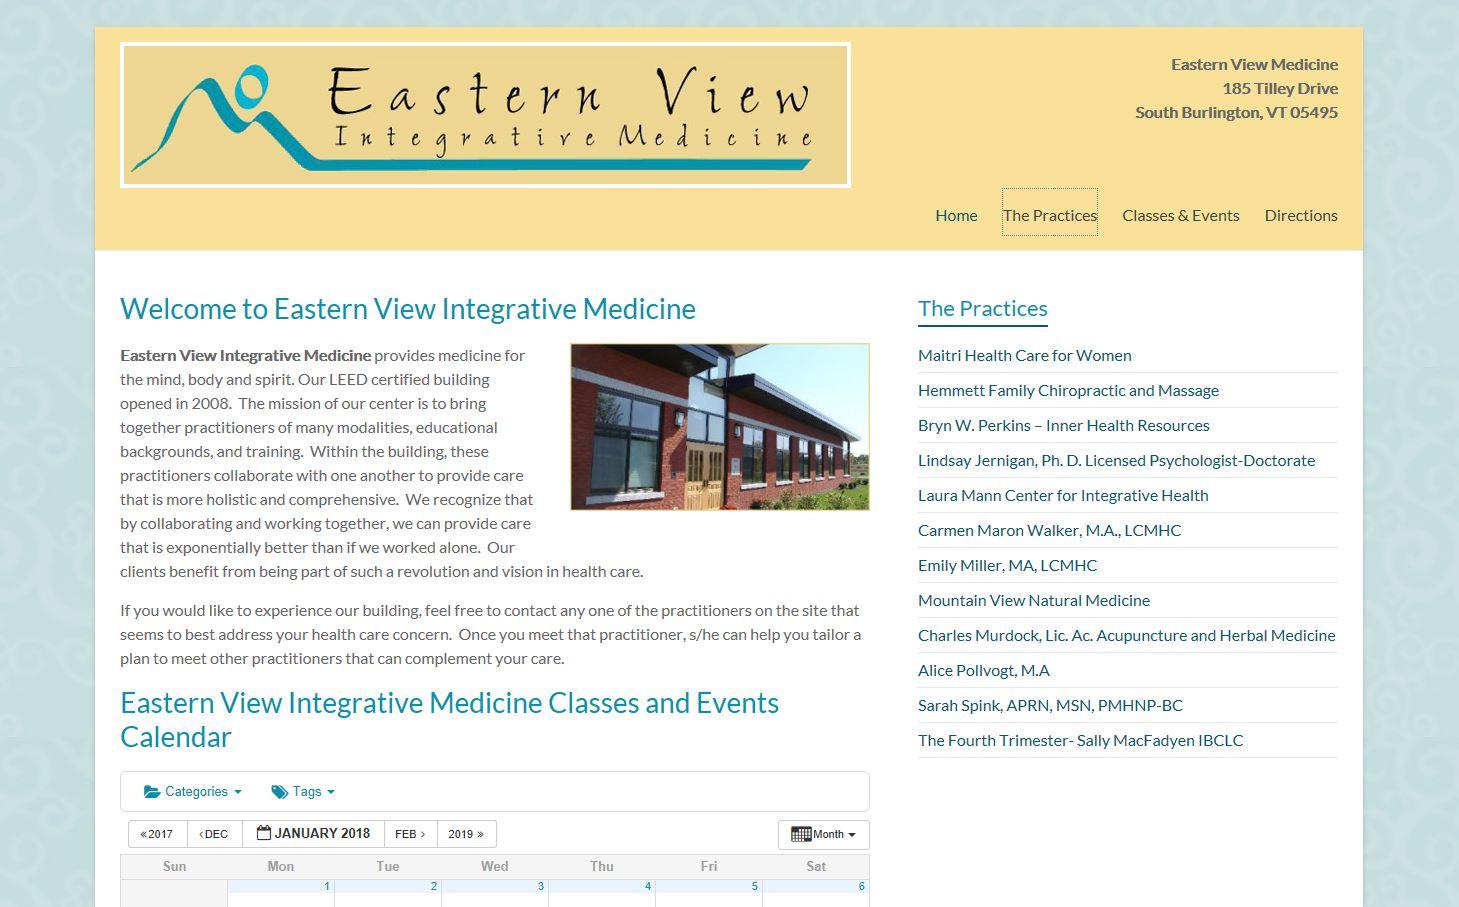 Eatern View Integrative Medicine